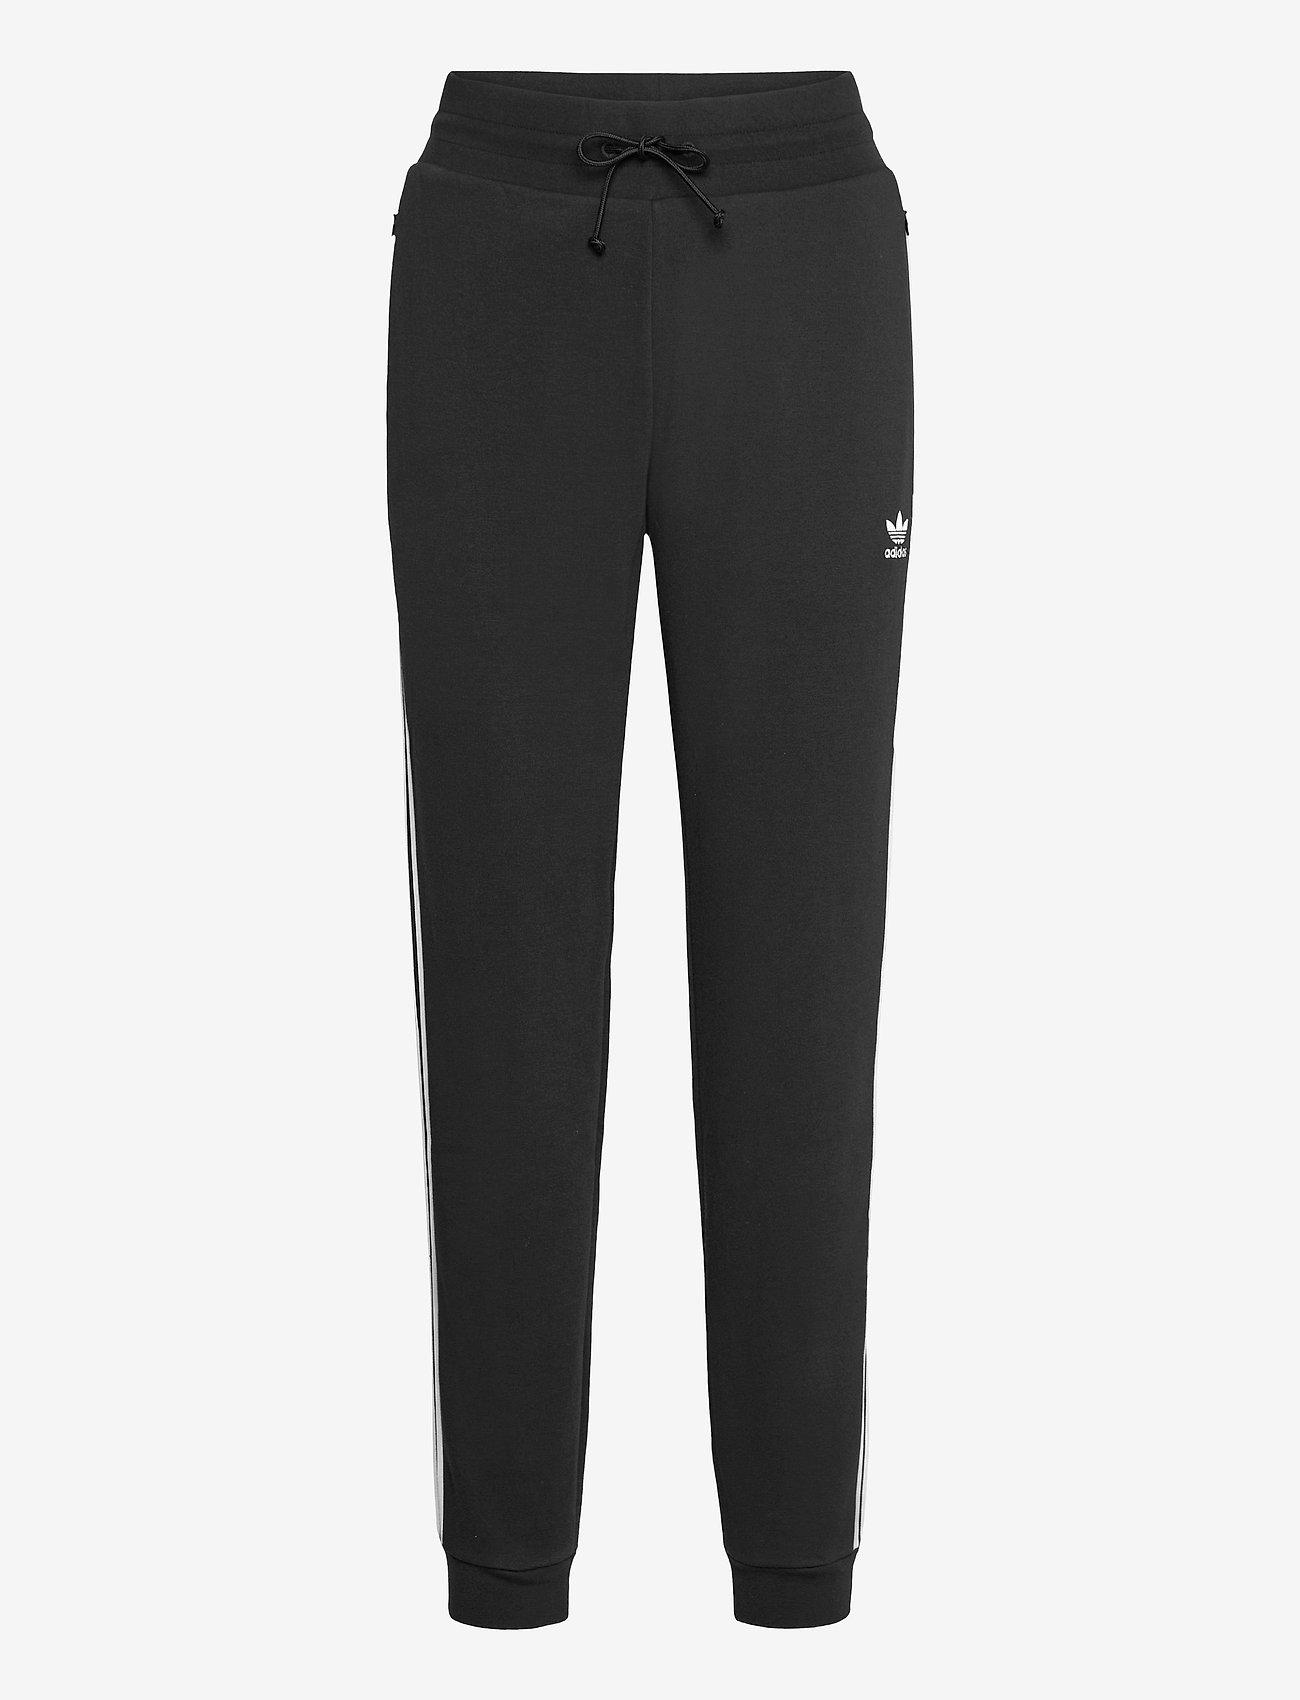 adidas Originals - Slim Cuffed Pants W - trainingsbroek - black - 1